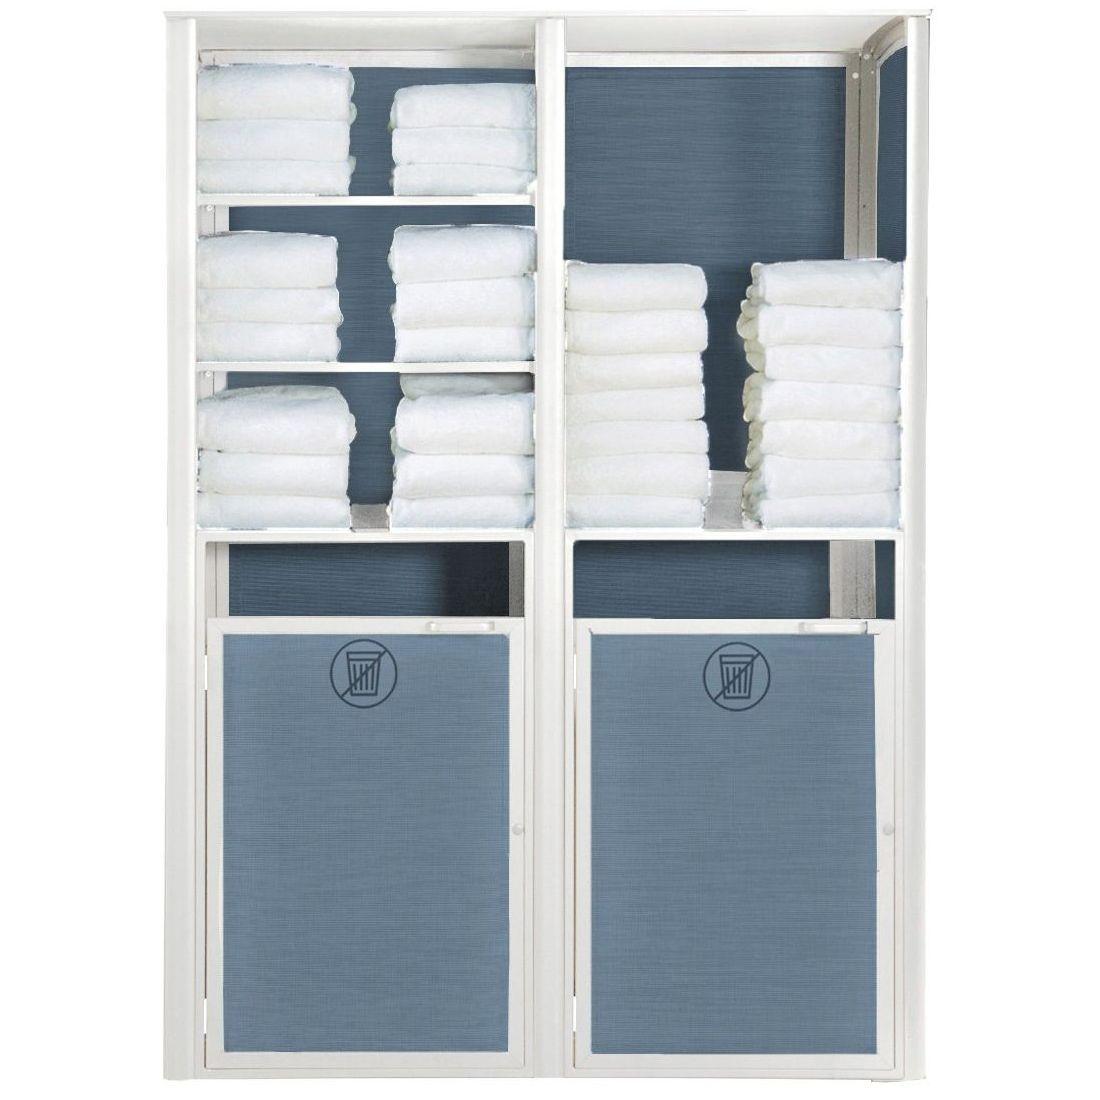 Grosfillex Sunset Towel Valet Double Unit in Blue/Glacier White